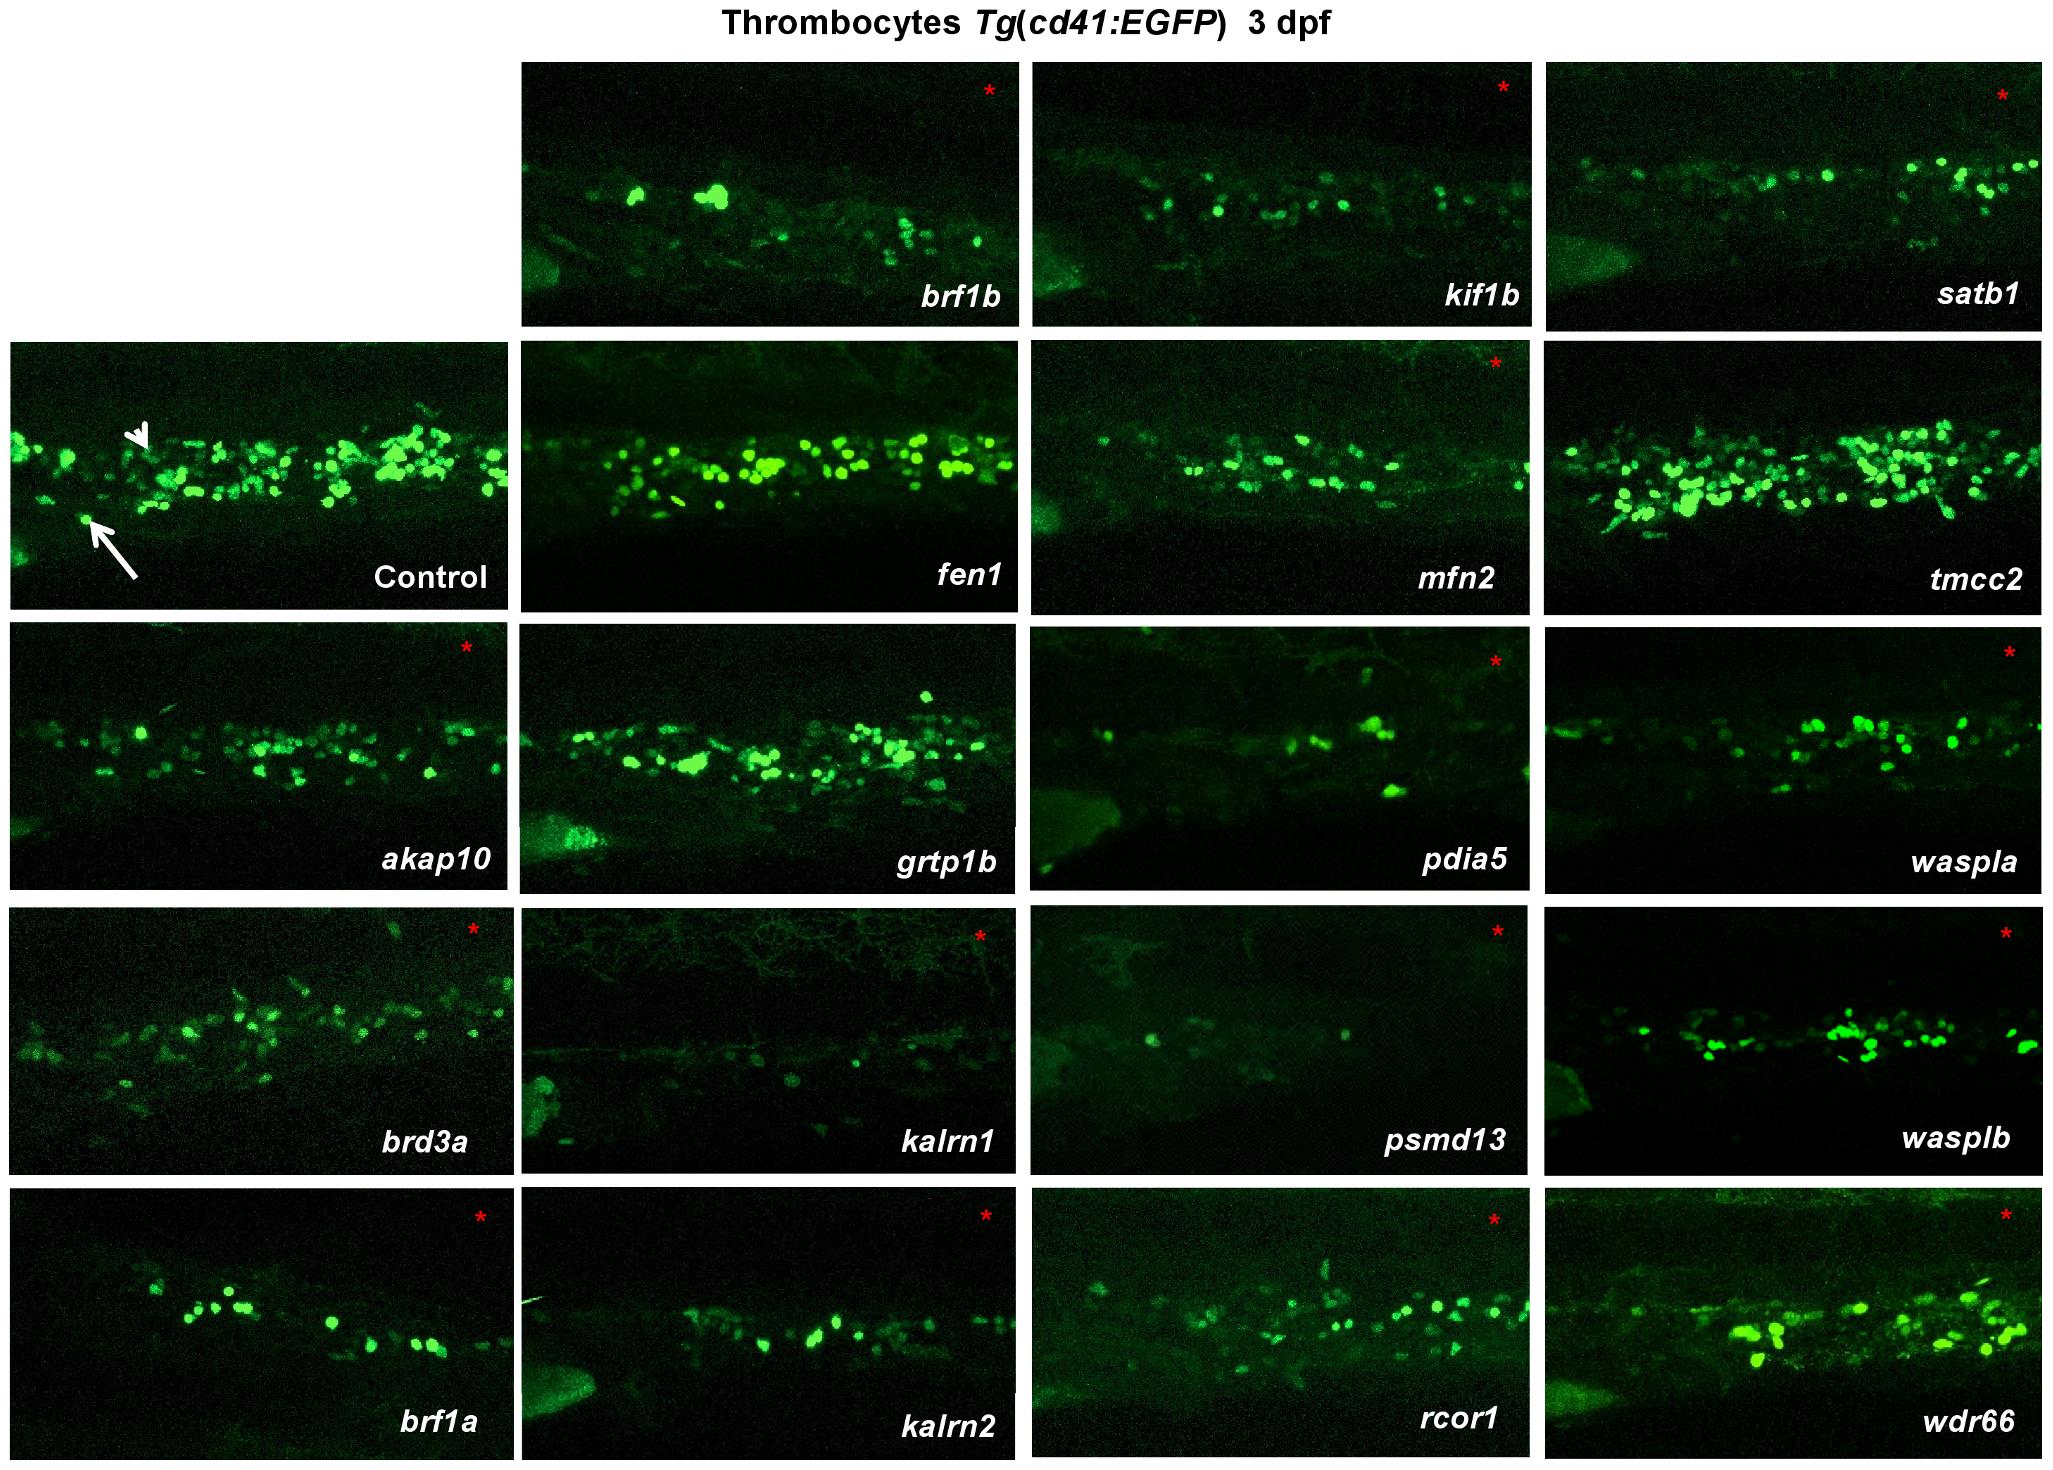 <i>In vivo</i> morpholino screen in zebrafish identifies 15 new regulators of thrombopoiesis.